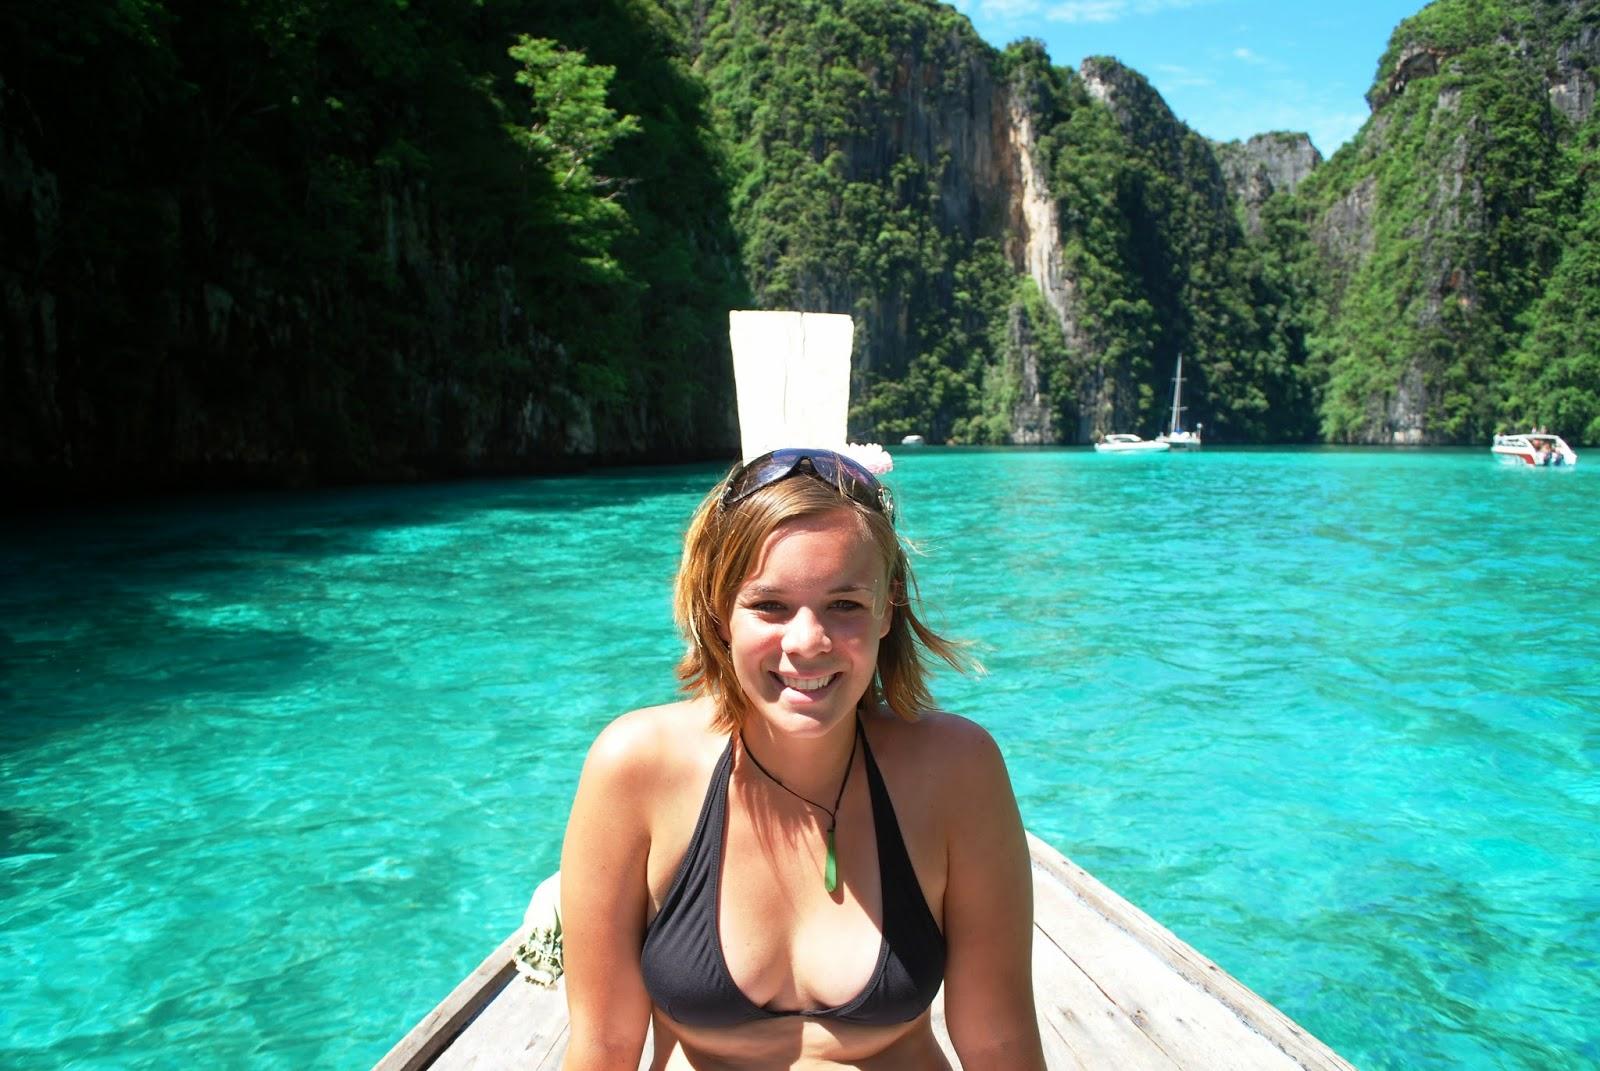 phi-phi-island-thailand-beach-asia